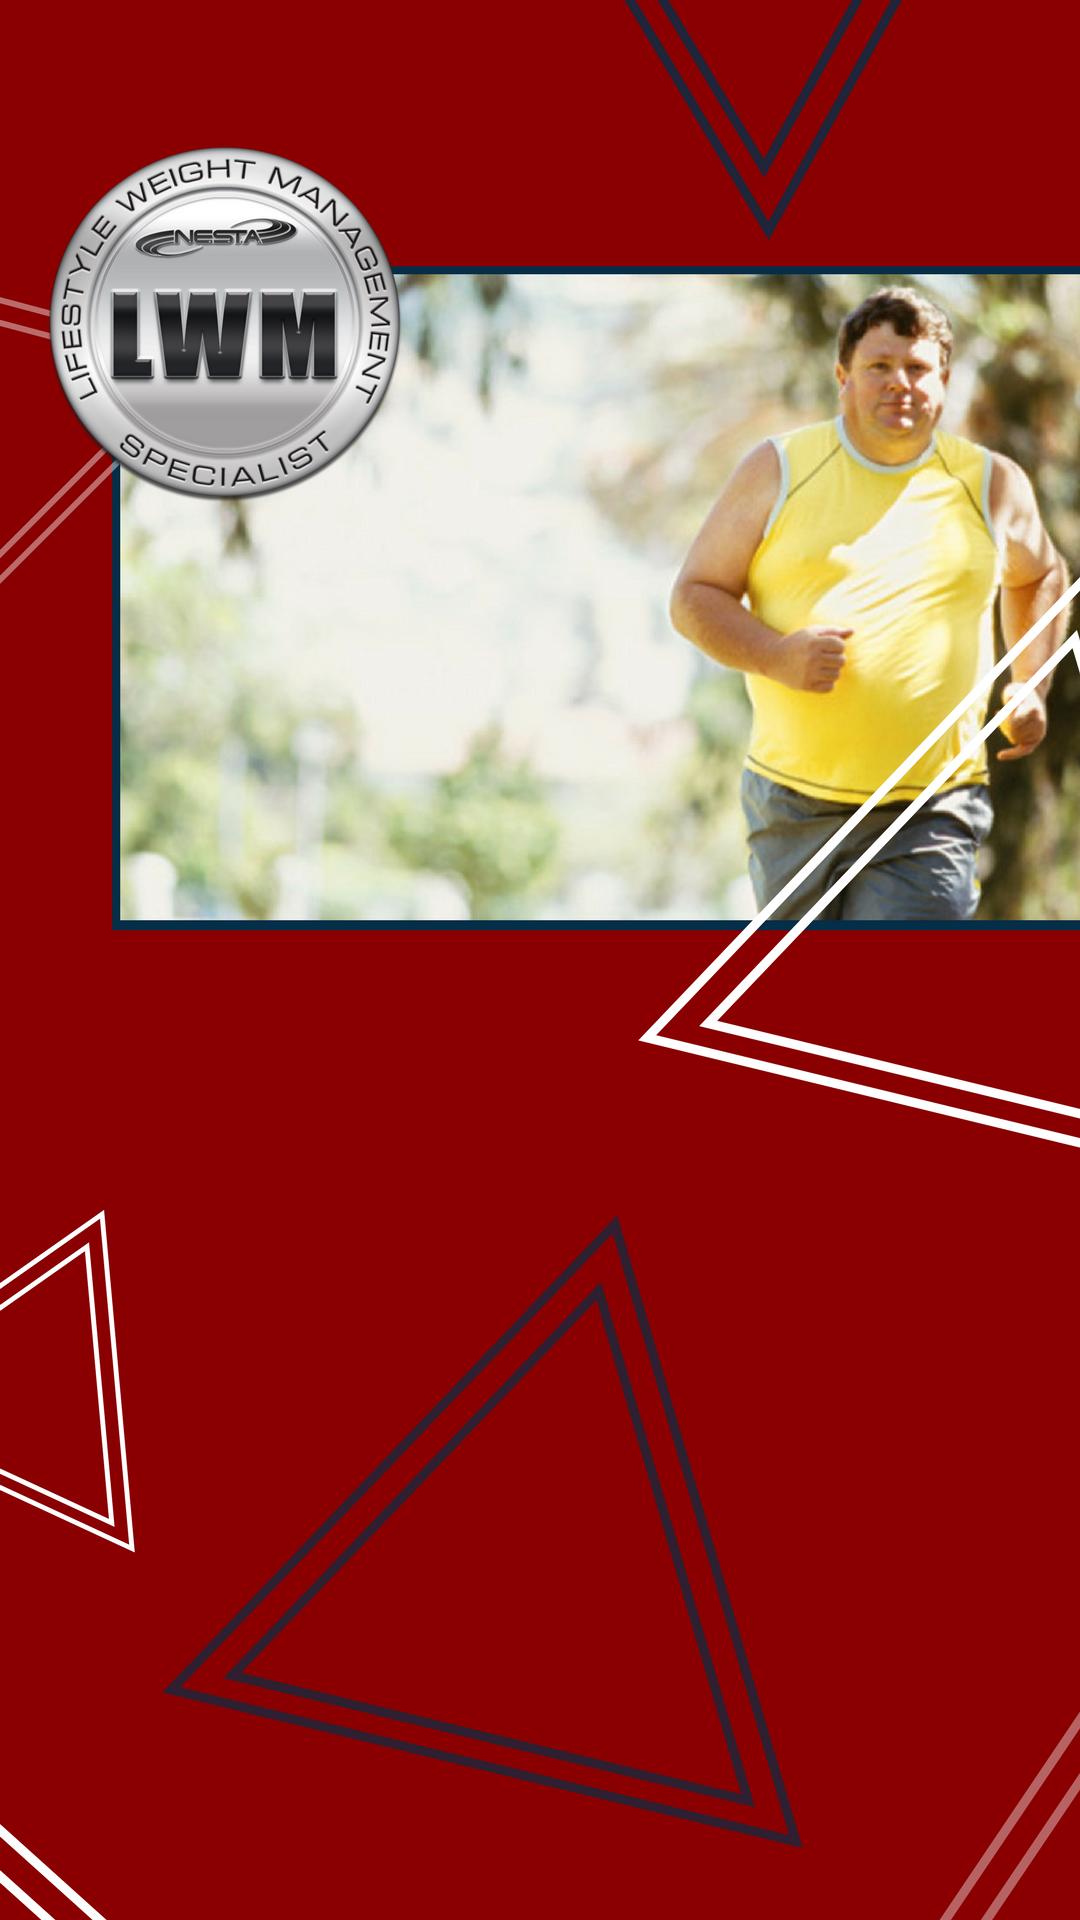 Lifestyle Weight Management Specialist Certification Pinterest